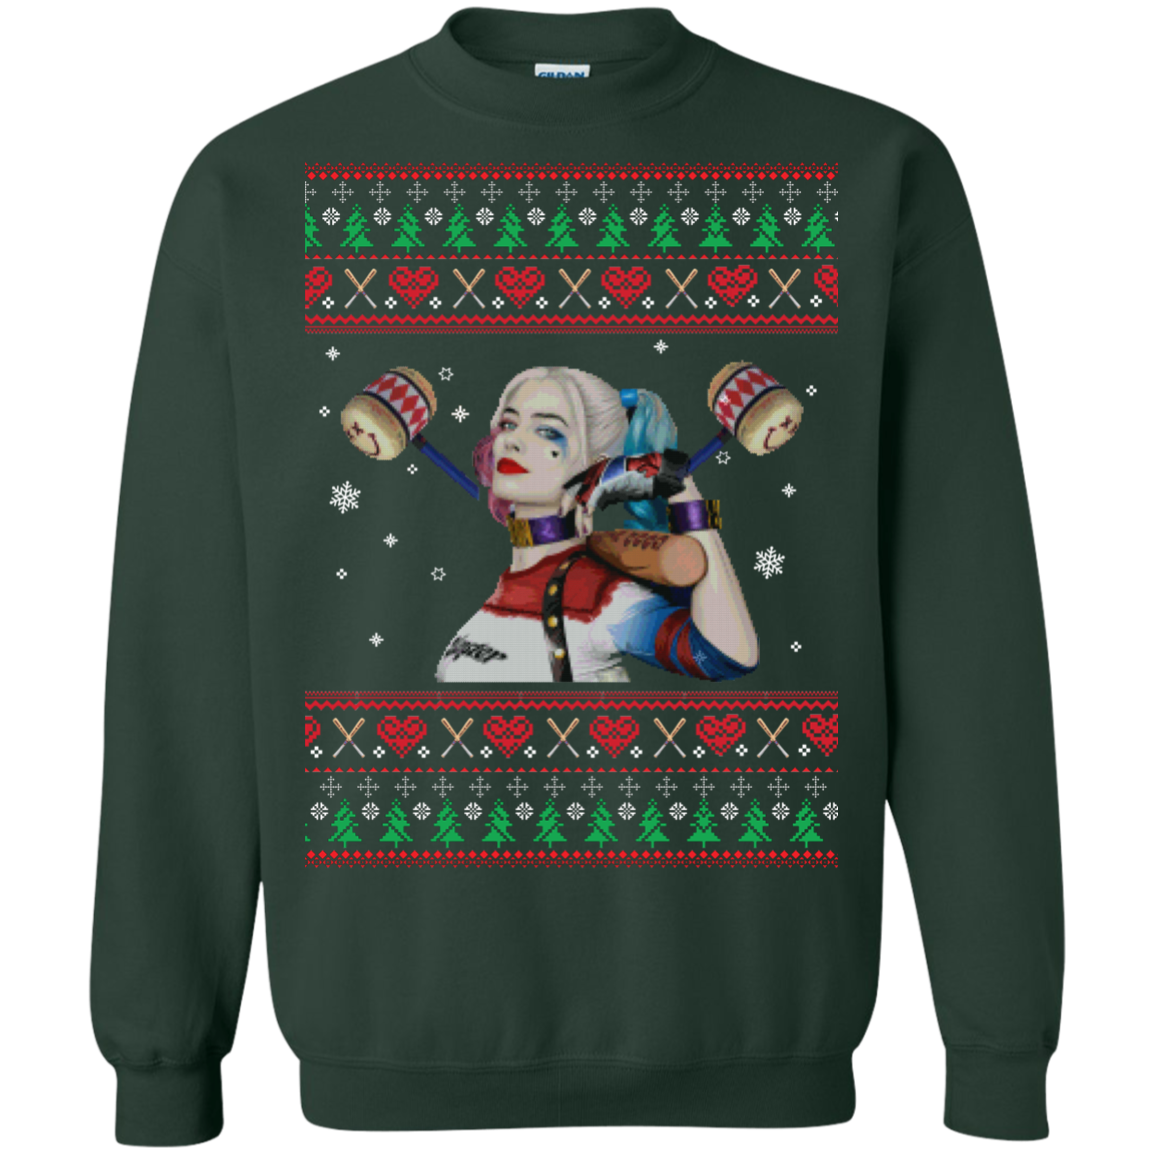 harley quinn unisex christmas sweater tshirt hoodie